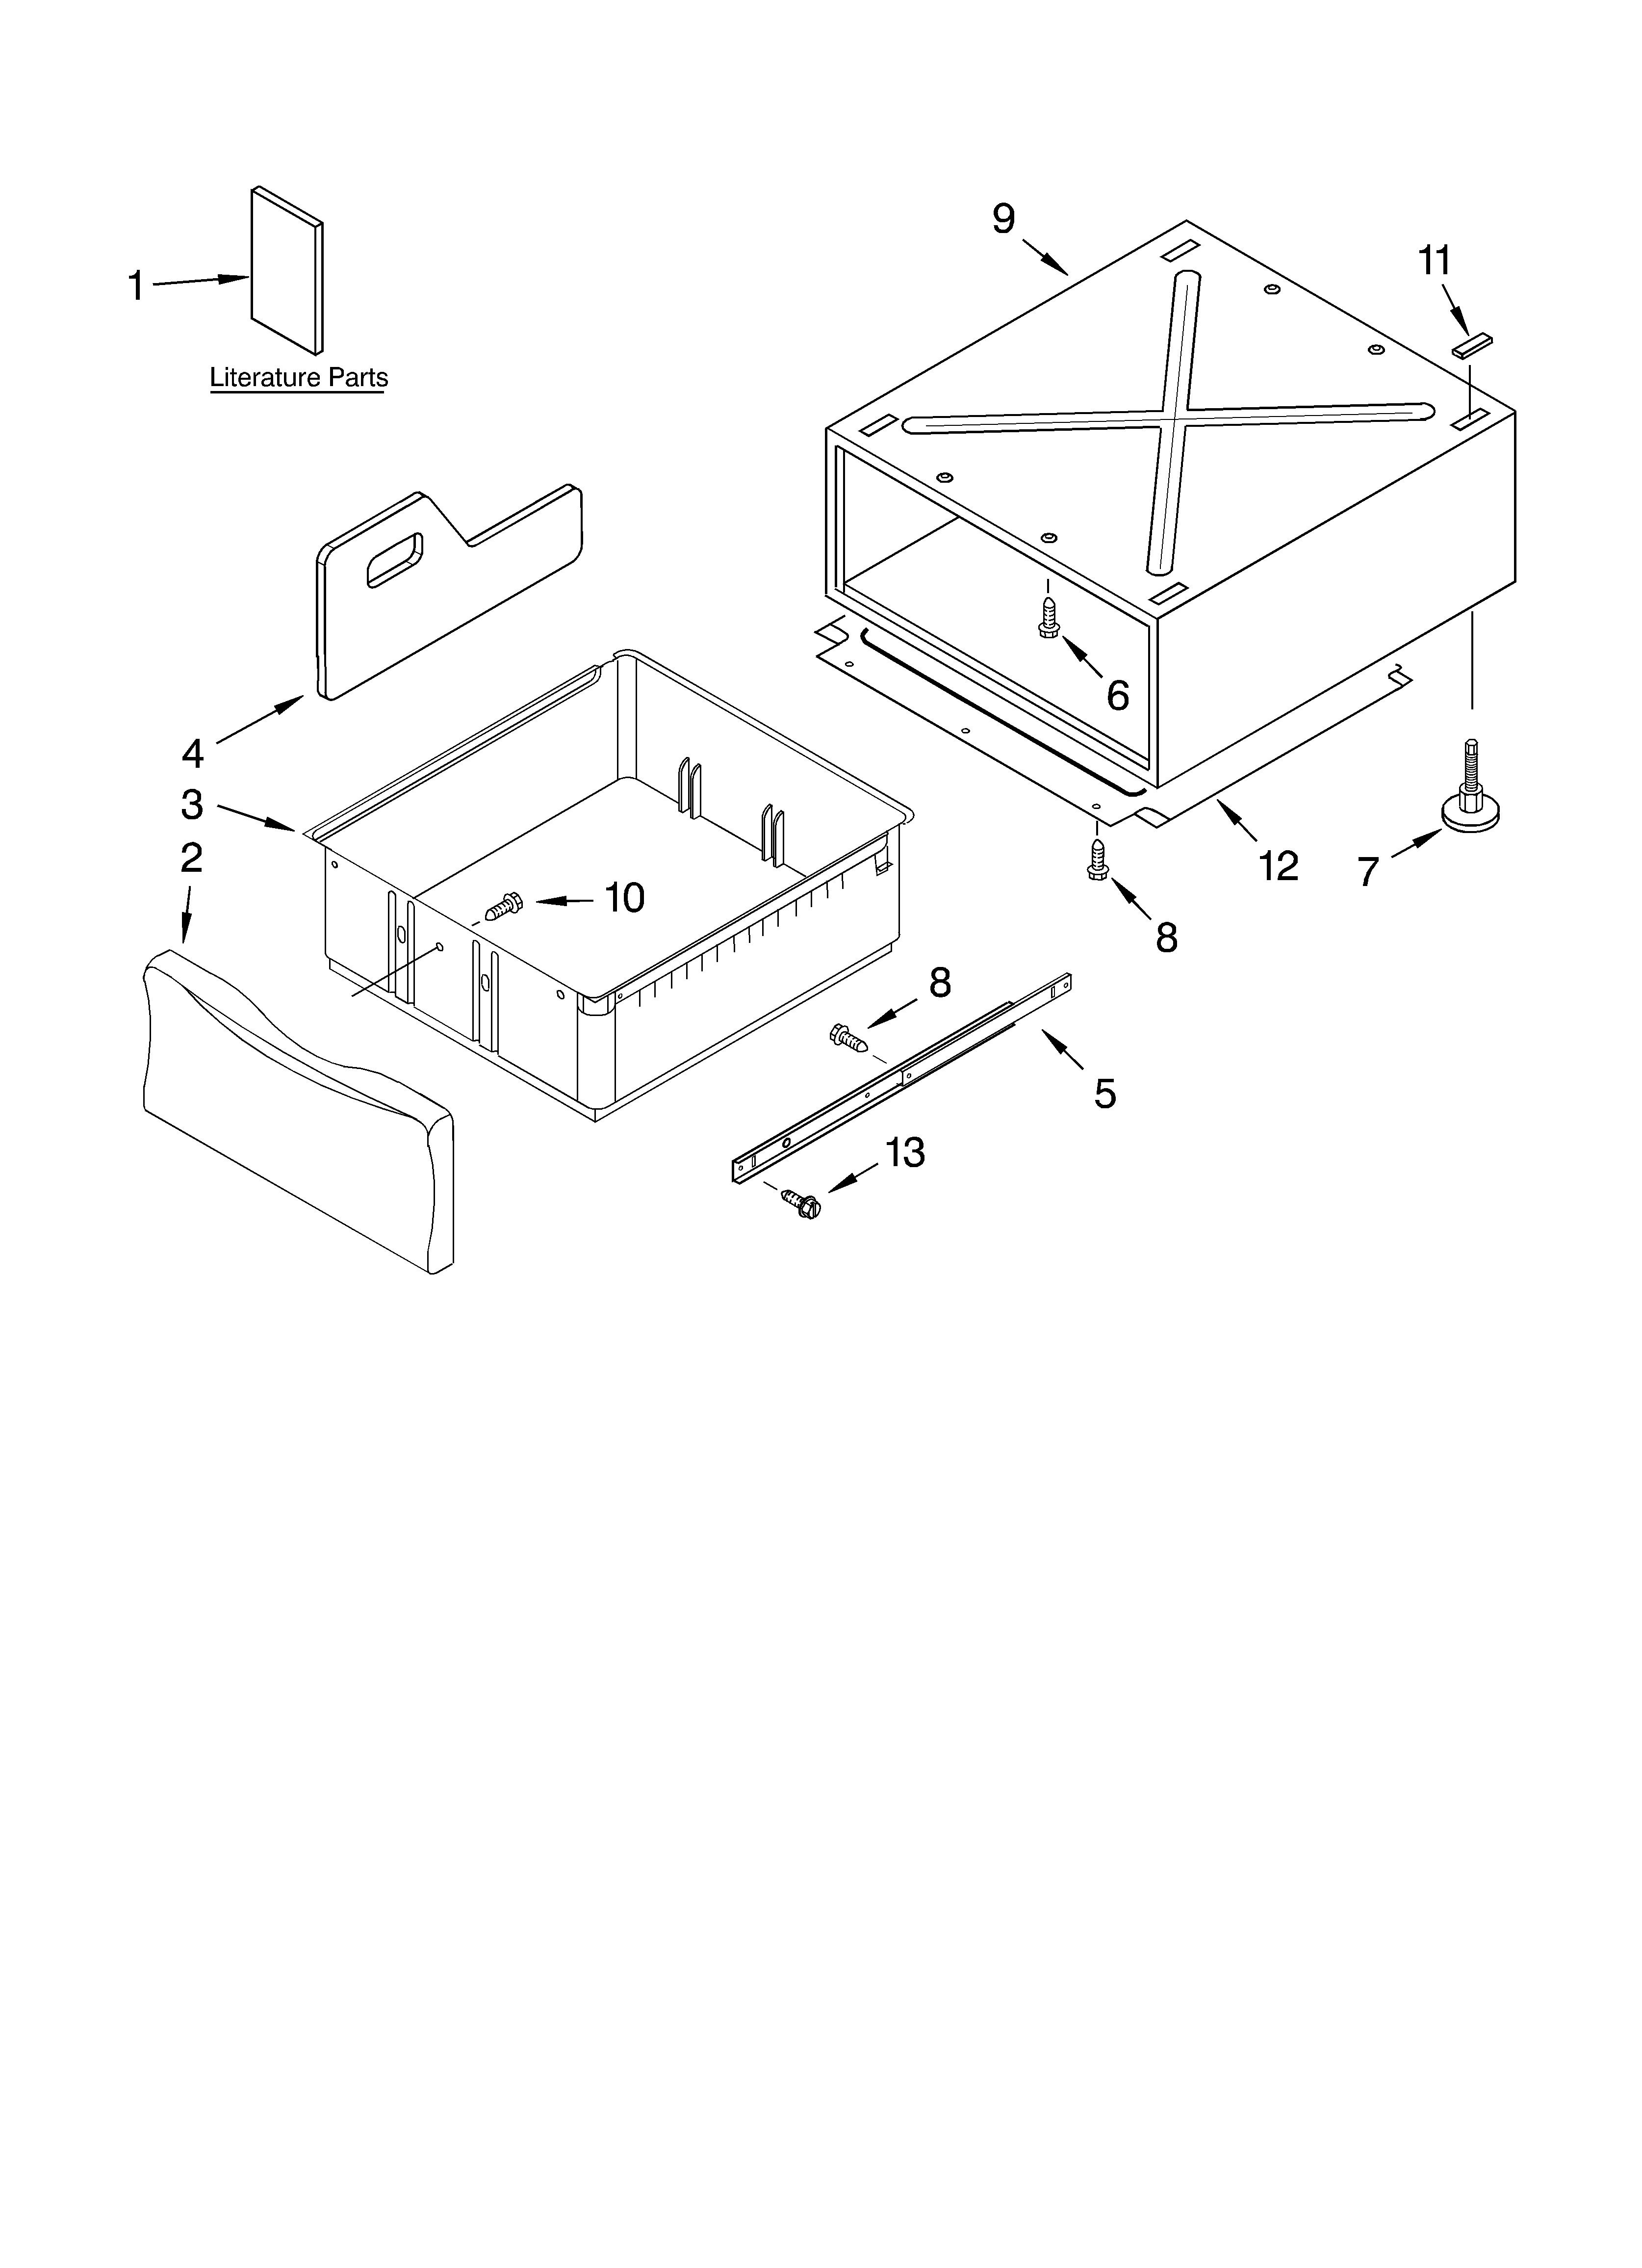 whirlpool residential dryer parts model gew9200lw1 sears pedestal part